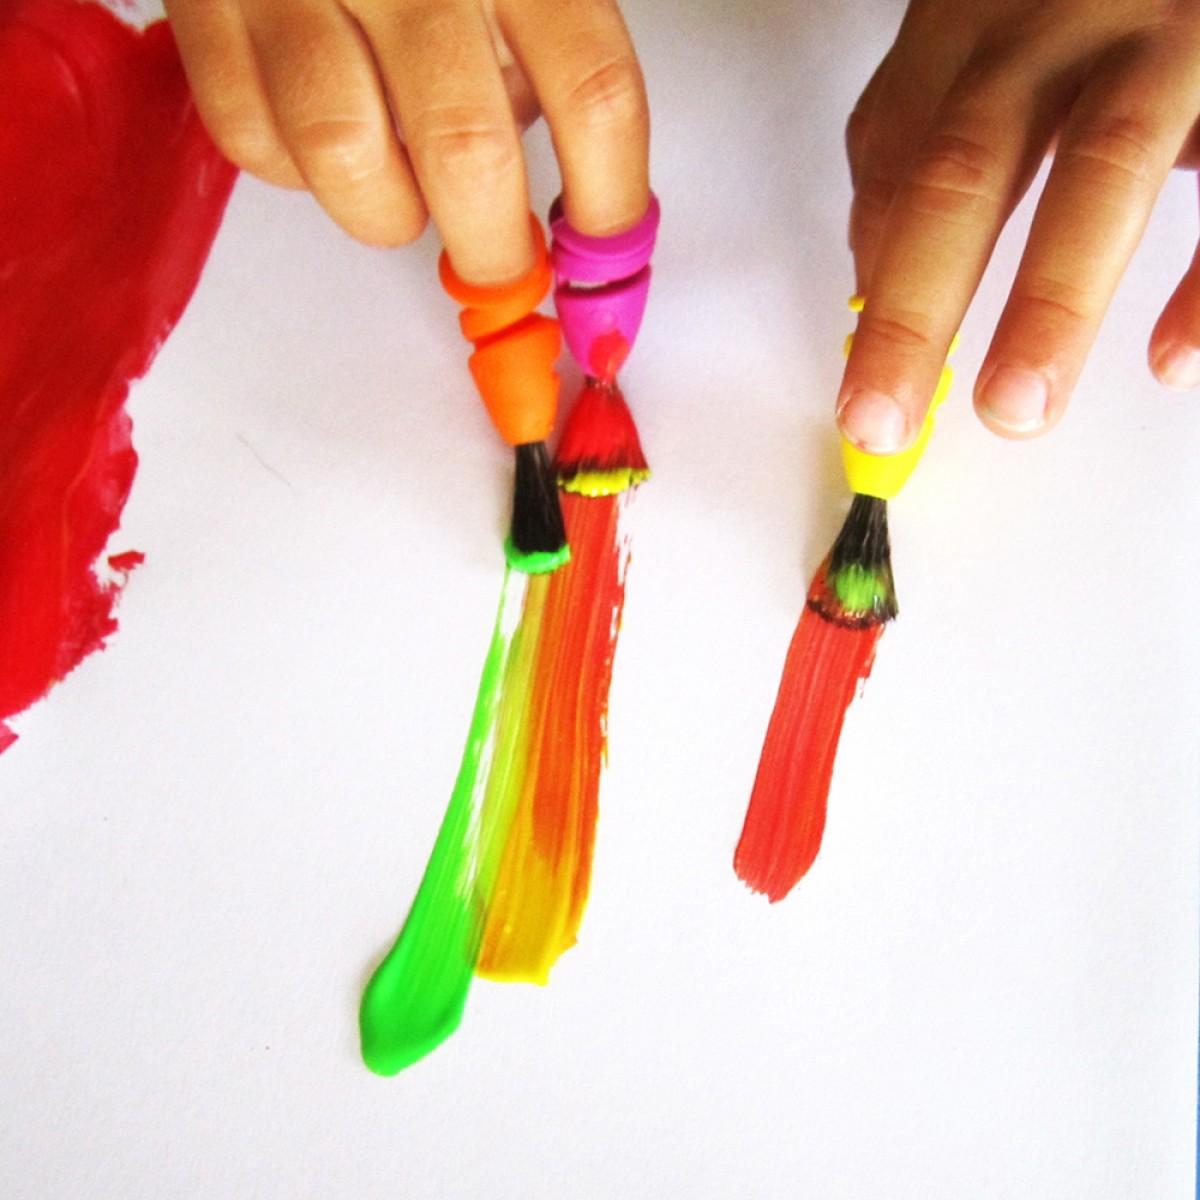 FINGERMAX - Fingerpinsel Klassen Set (20 x Fingermax Pinsel)